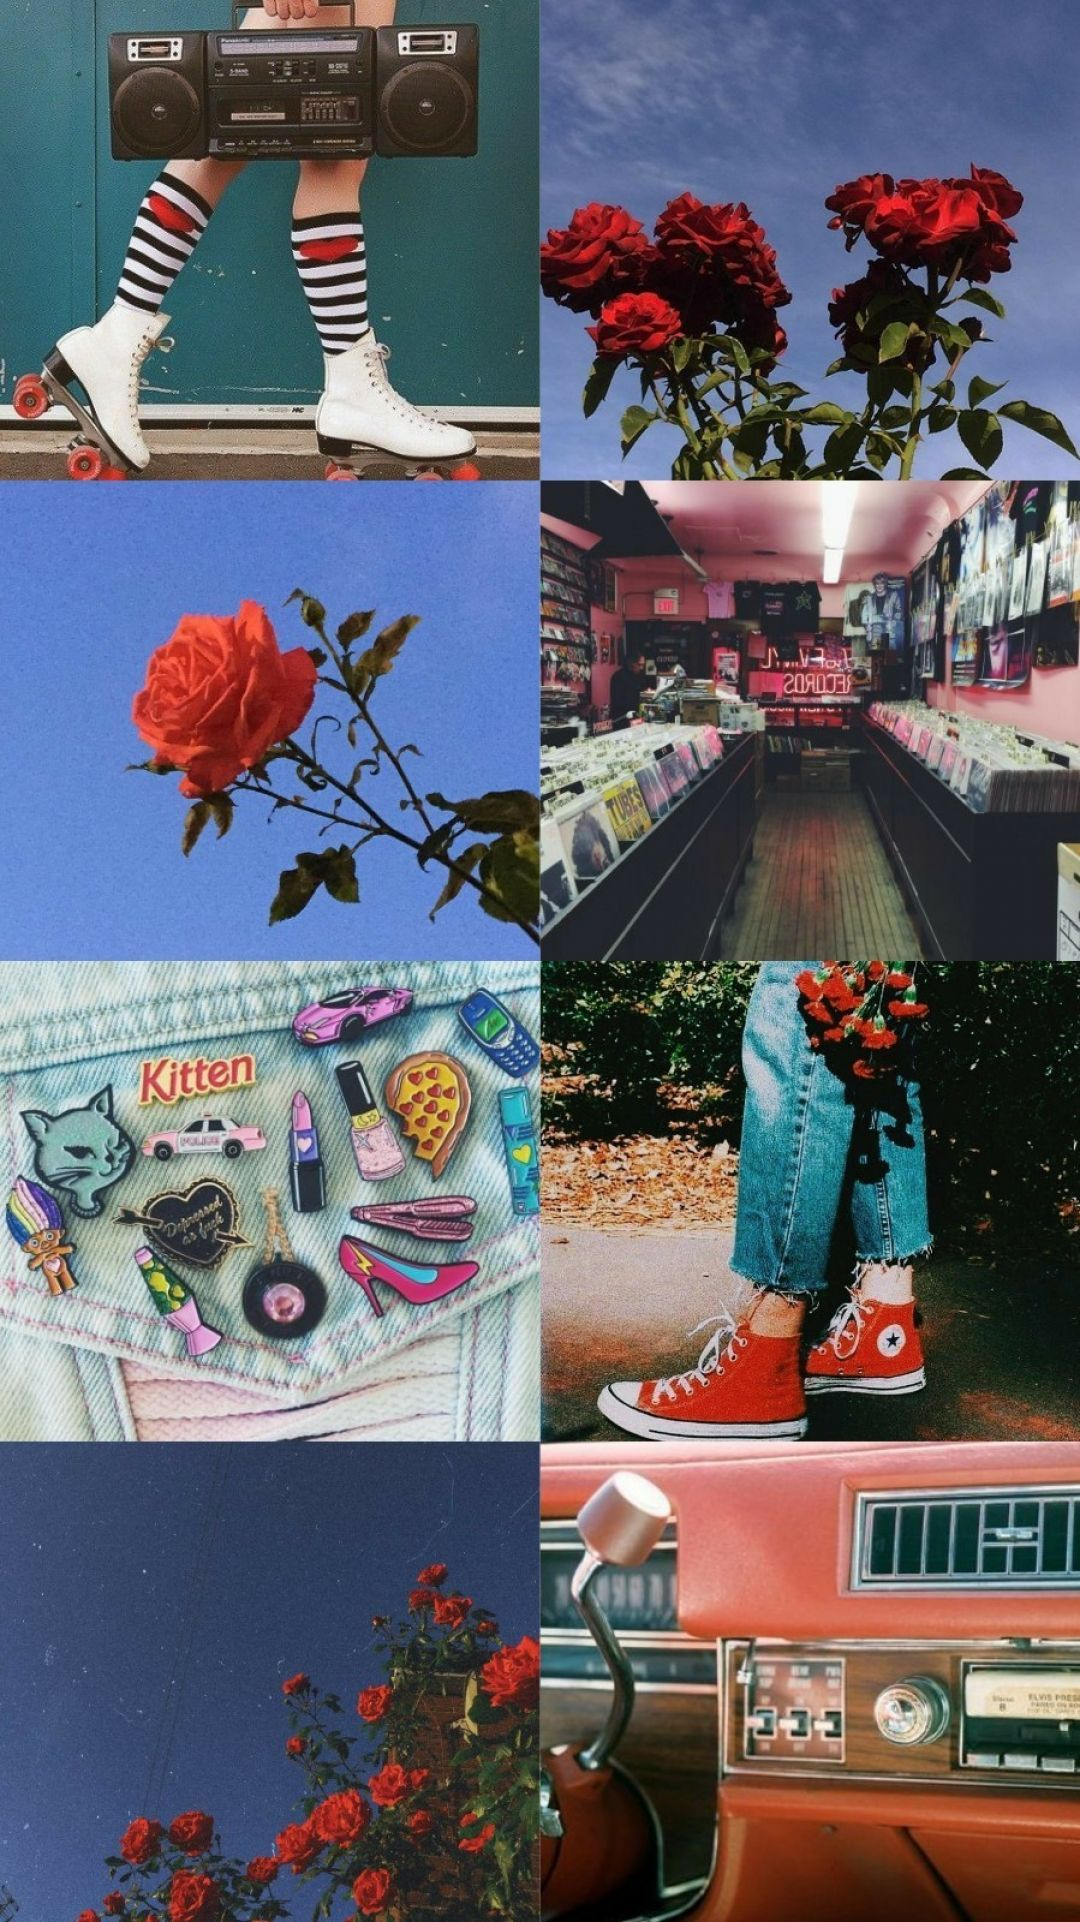 Download 90's wallpaper aesthetic anime for desktop or mobile device. Aesthetics Retro Wallpapers - Wallpaper Cave